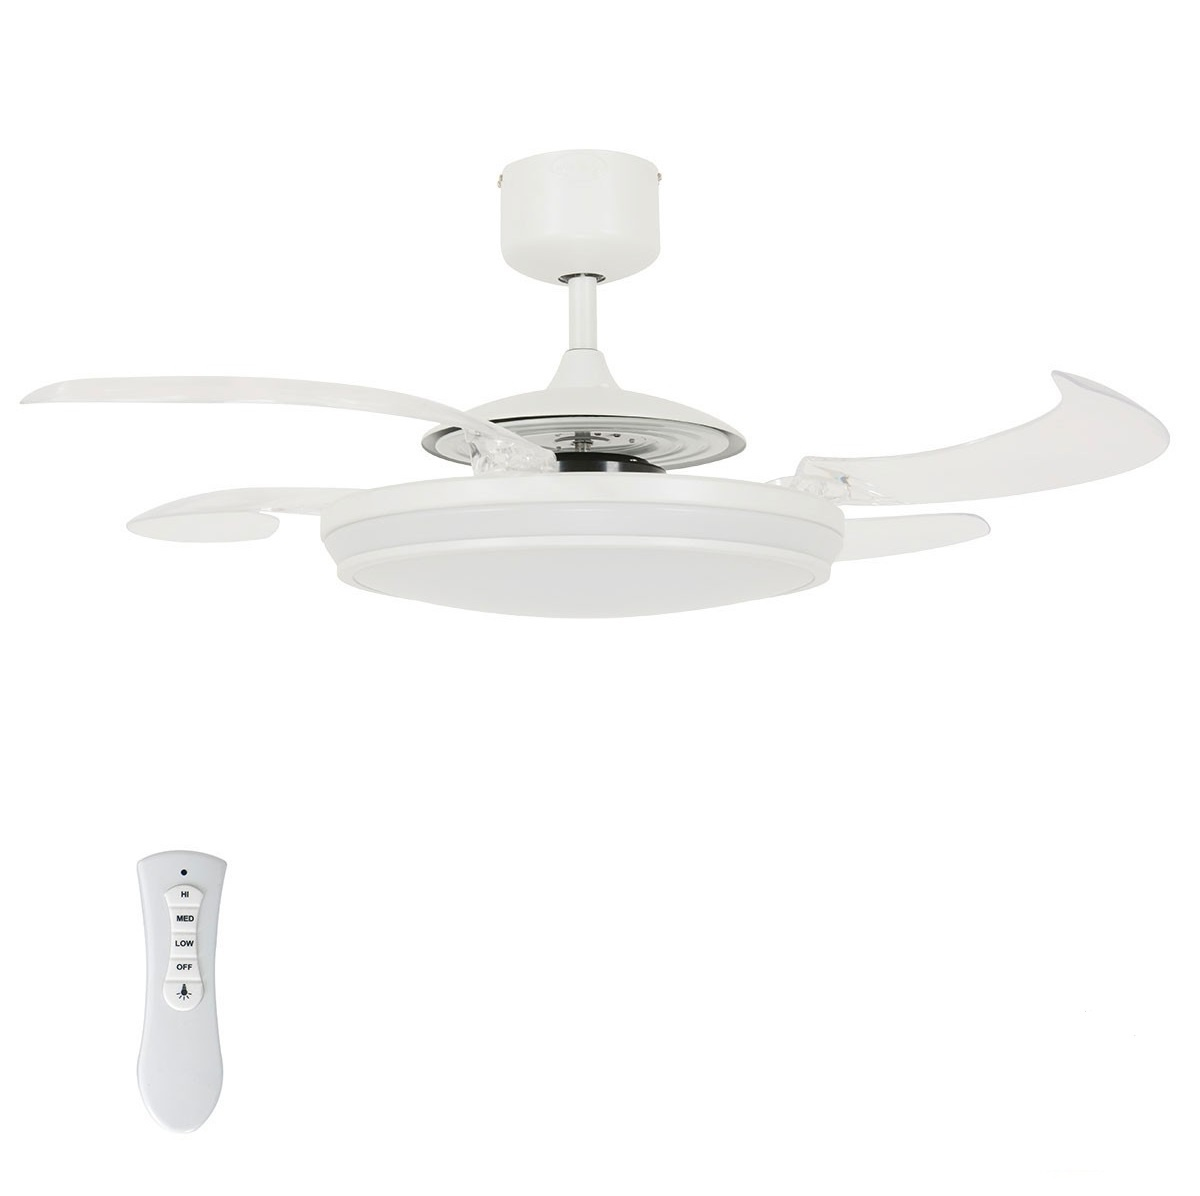 Lucci Plafondventilator Fanaway LED White 121cm